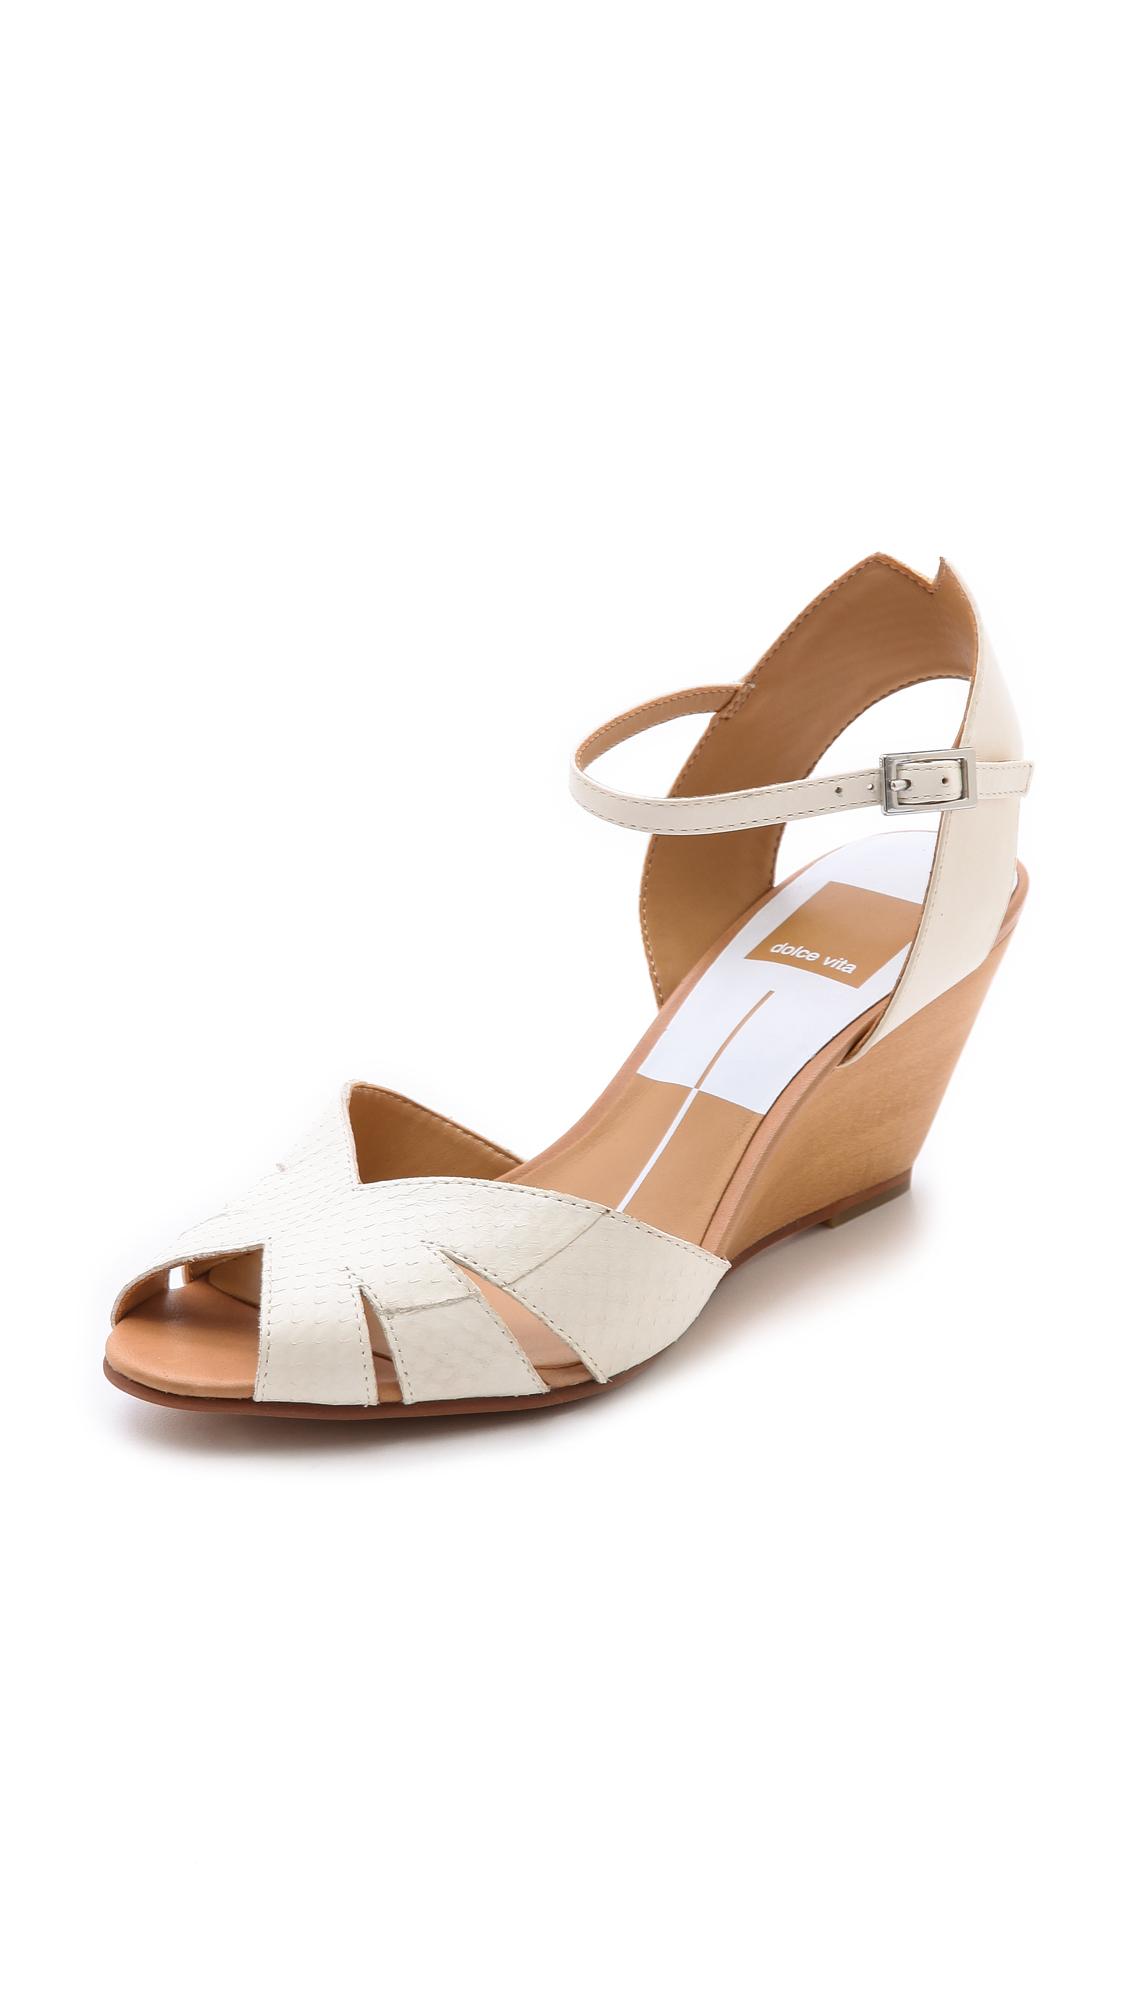 dolce vita kimbra wedge sandals in white white lyst